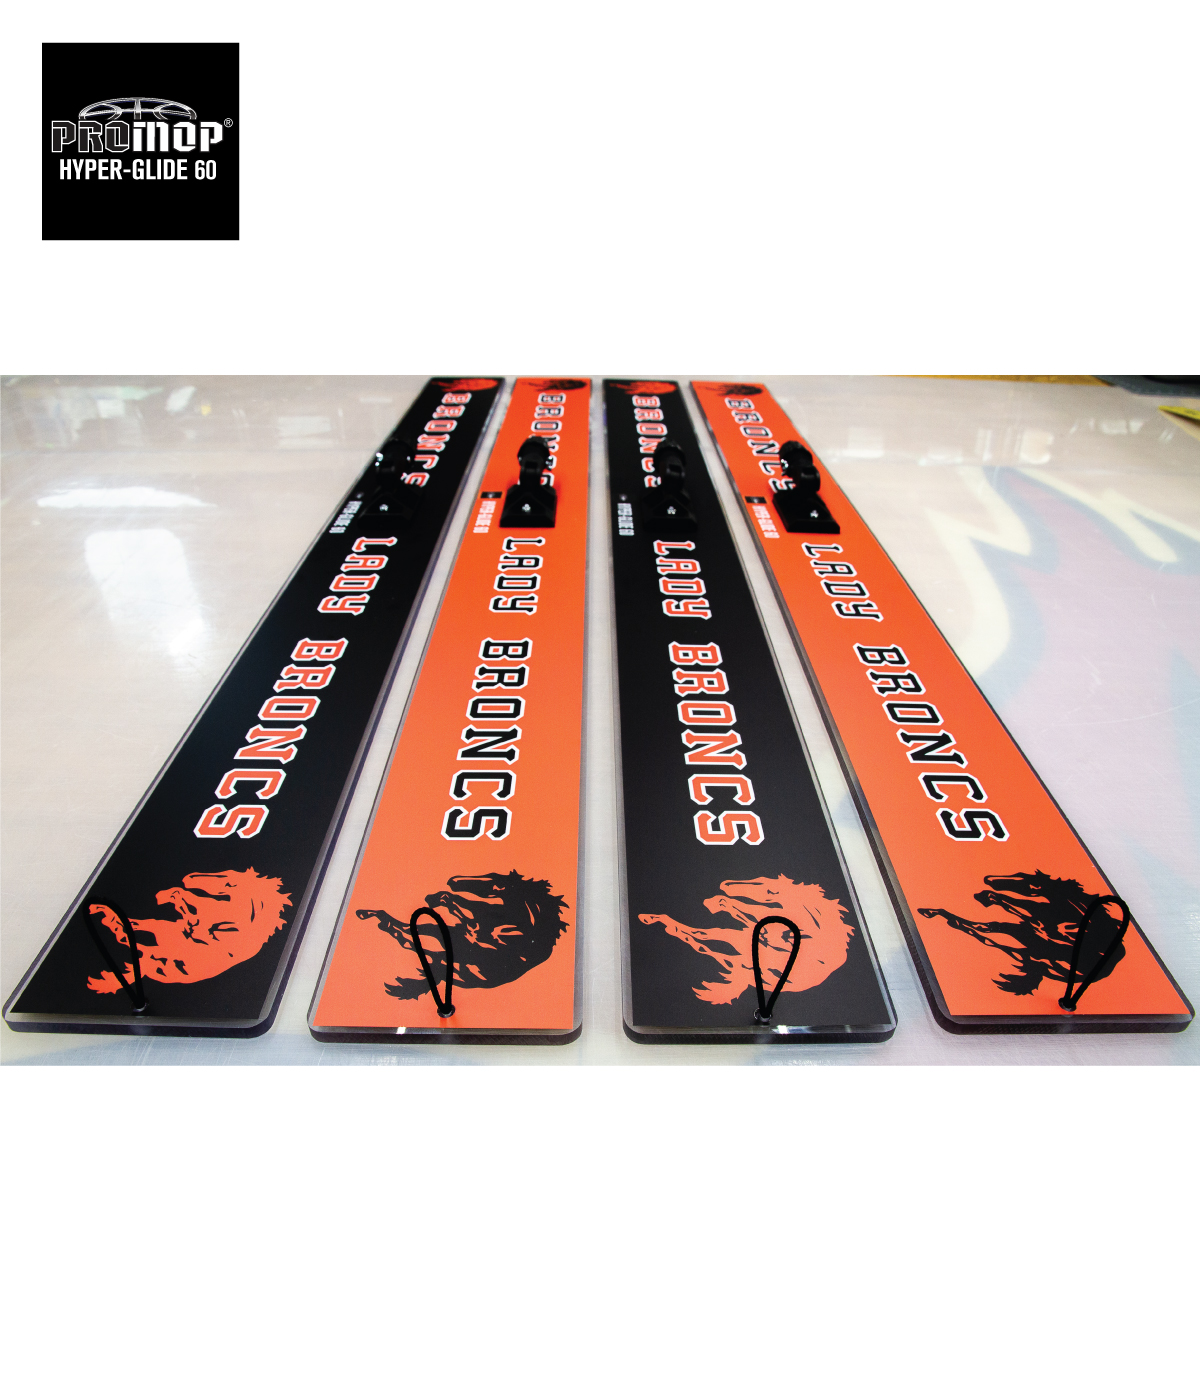 PROMOP HYPER-GLIDE 60 BASKETBALL / VOLLEYBALL HEAVY-WEIGHT GYM FLOOR CLEANING MOP